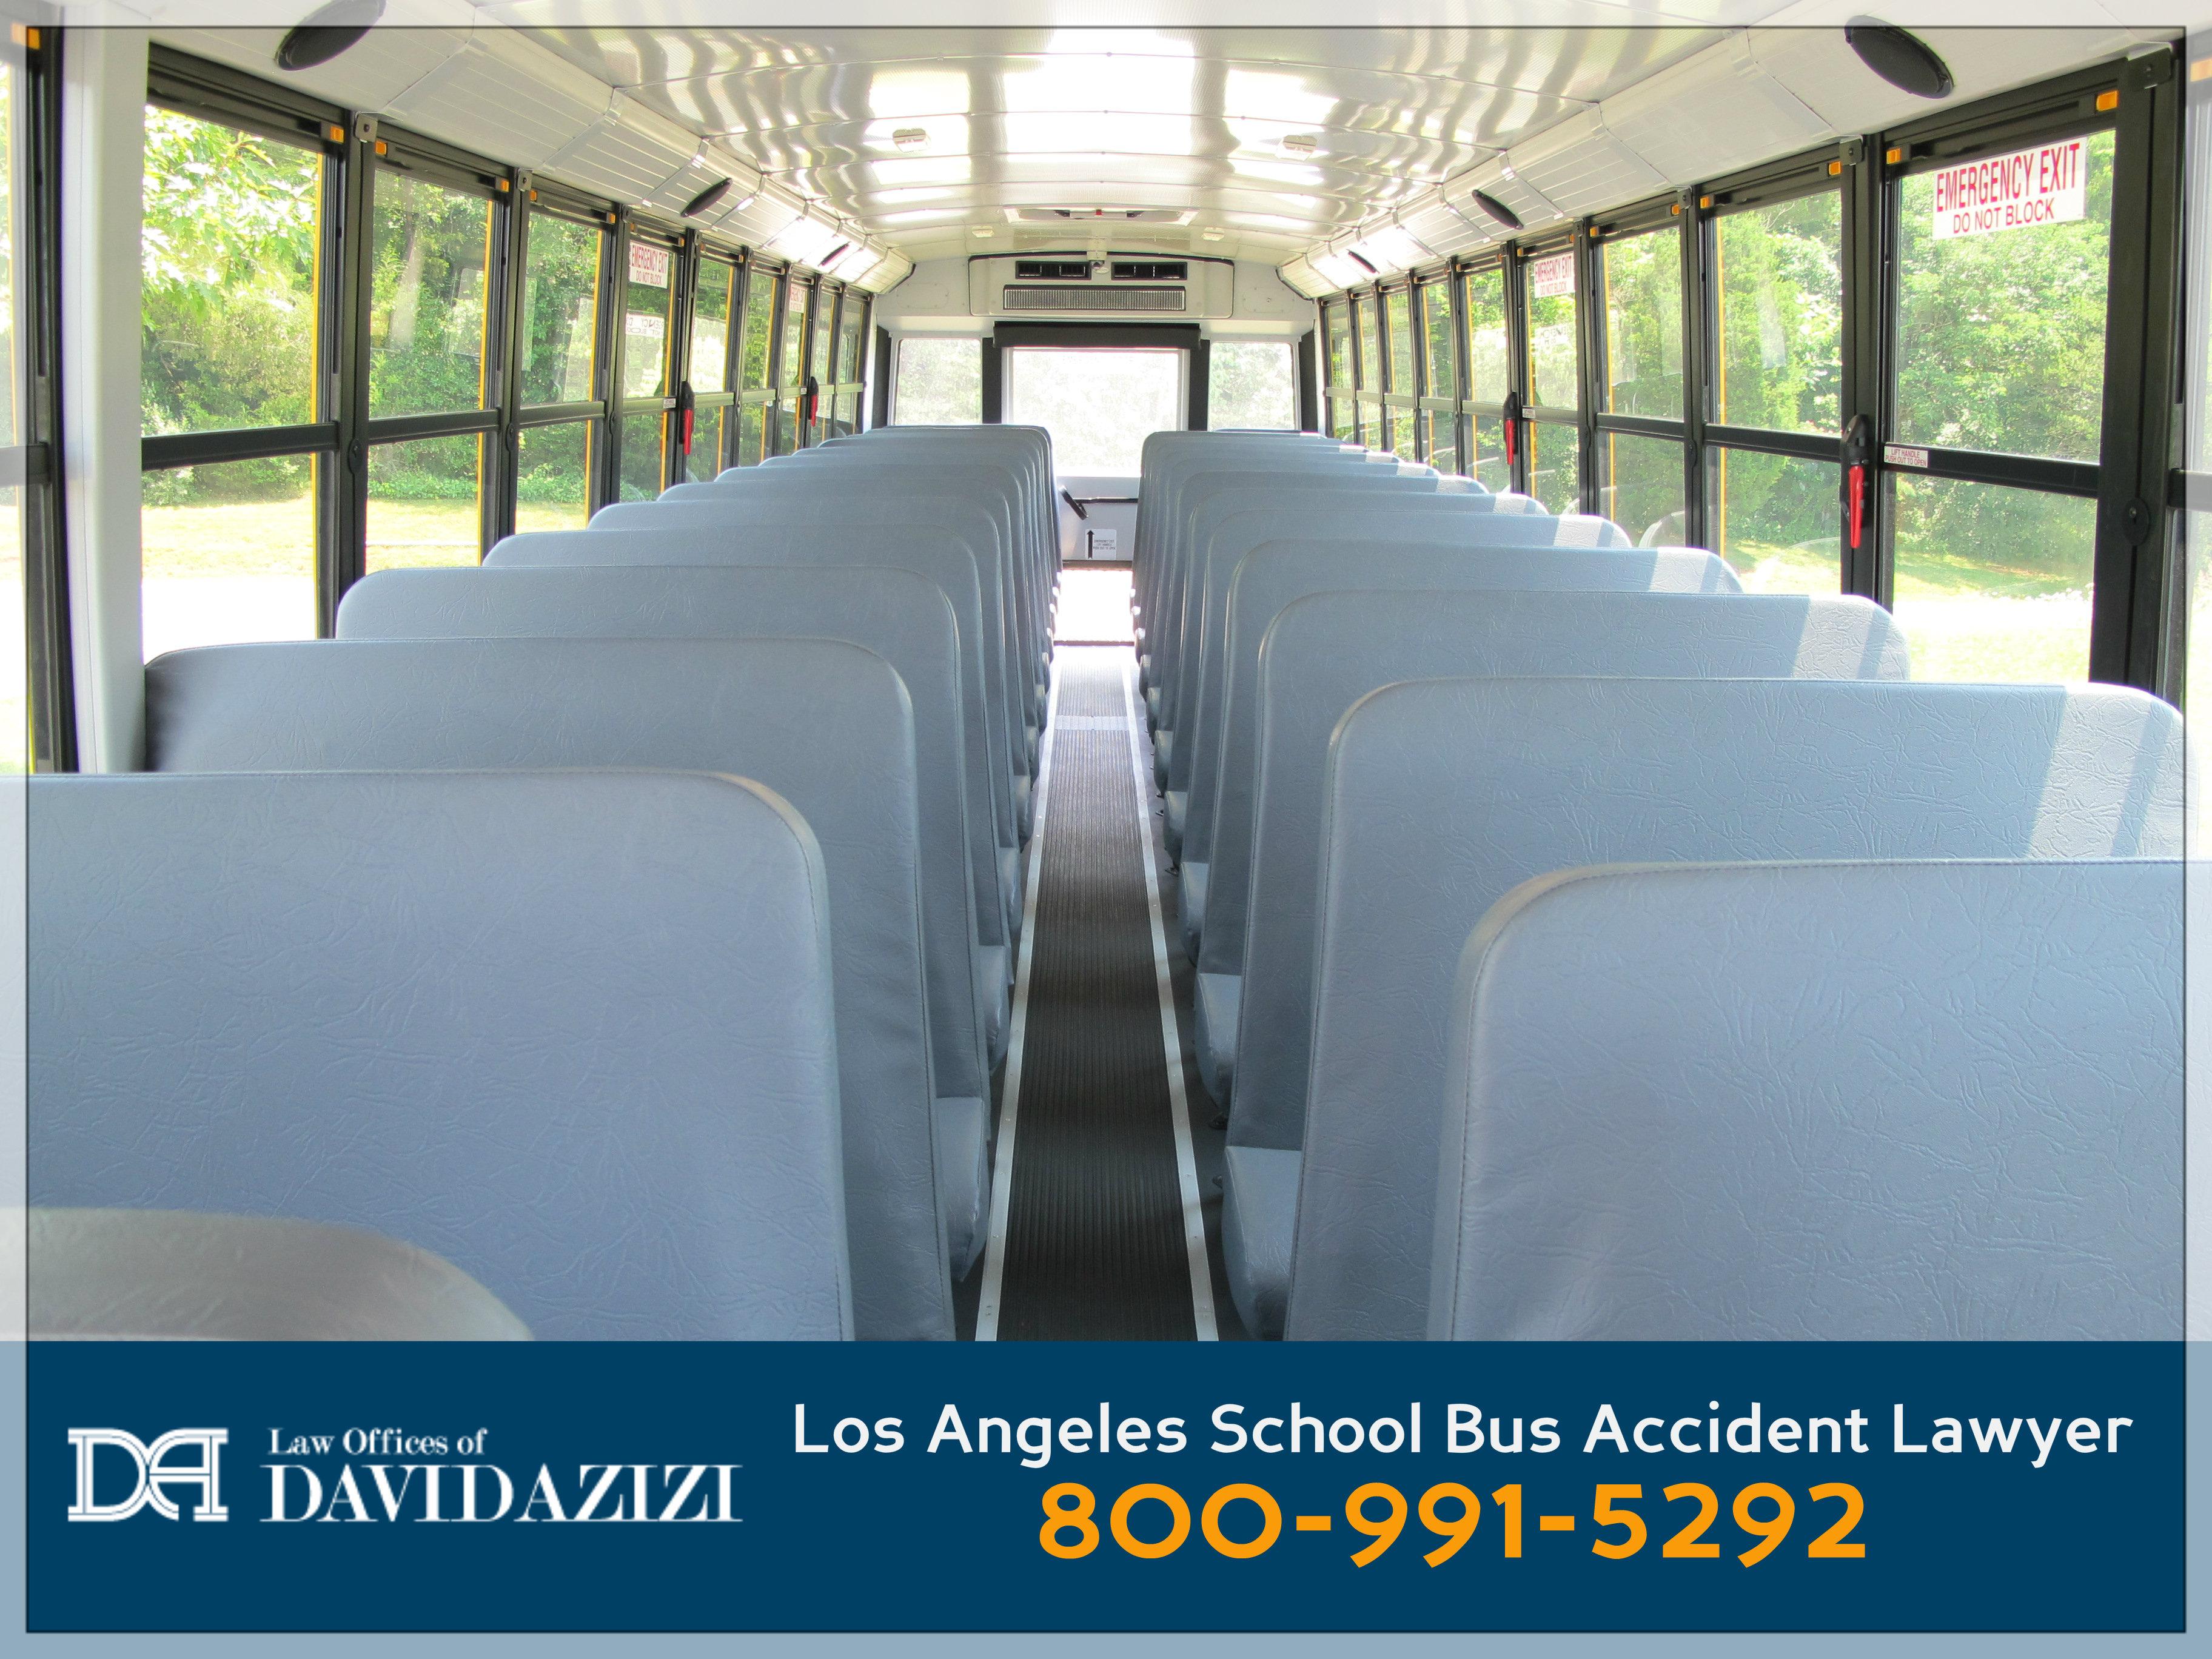 School Bus Interior - Bus Accident Lawyer David Azizi